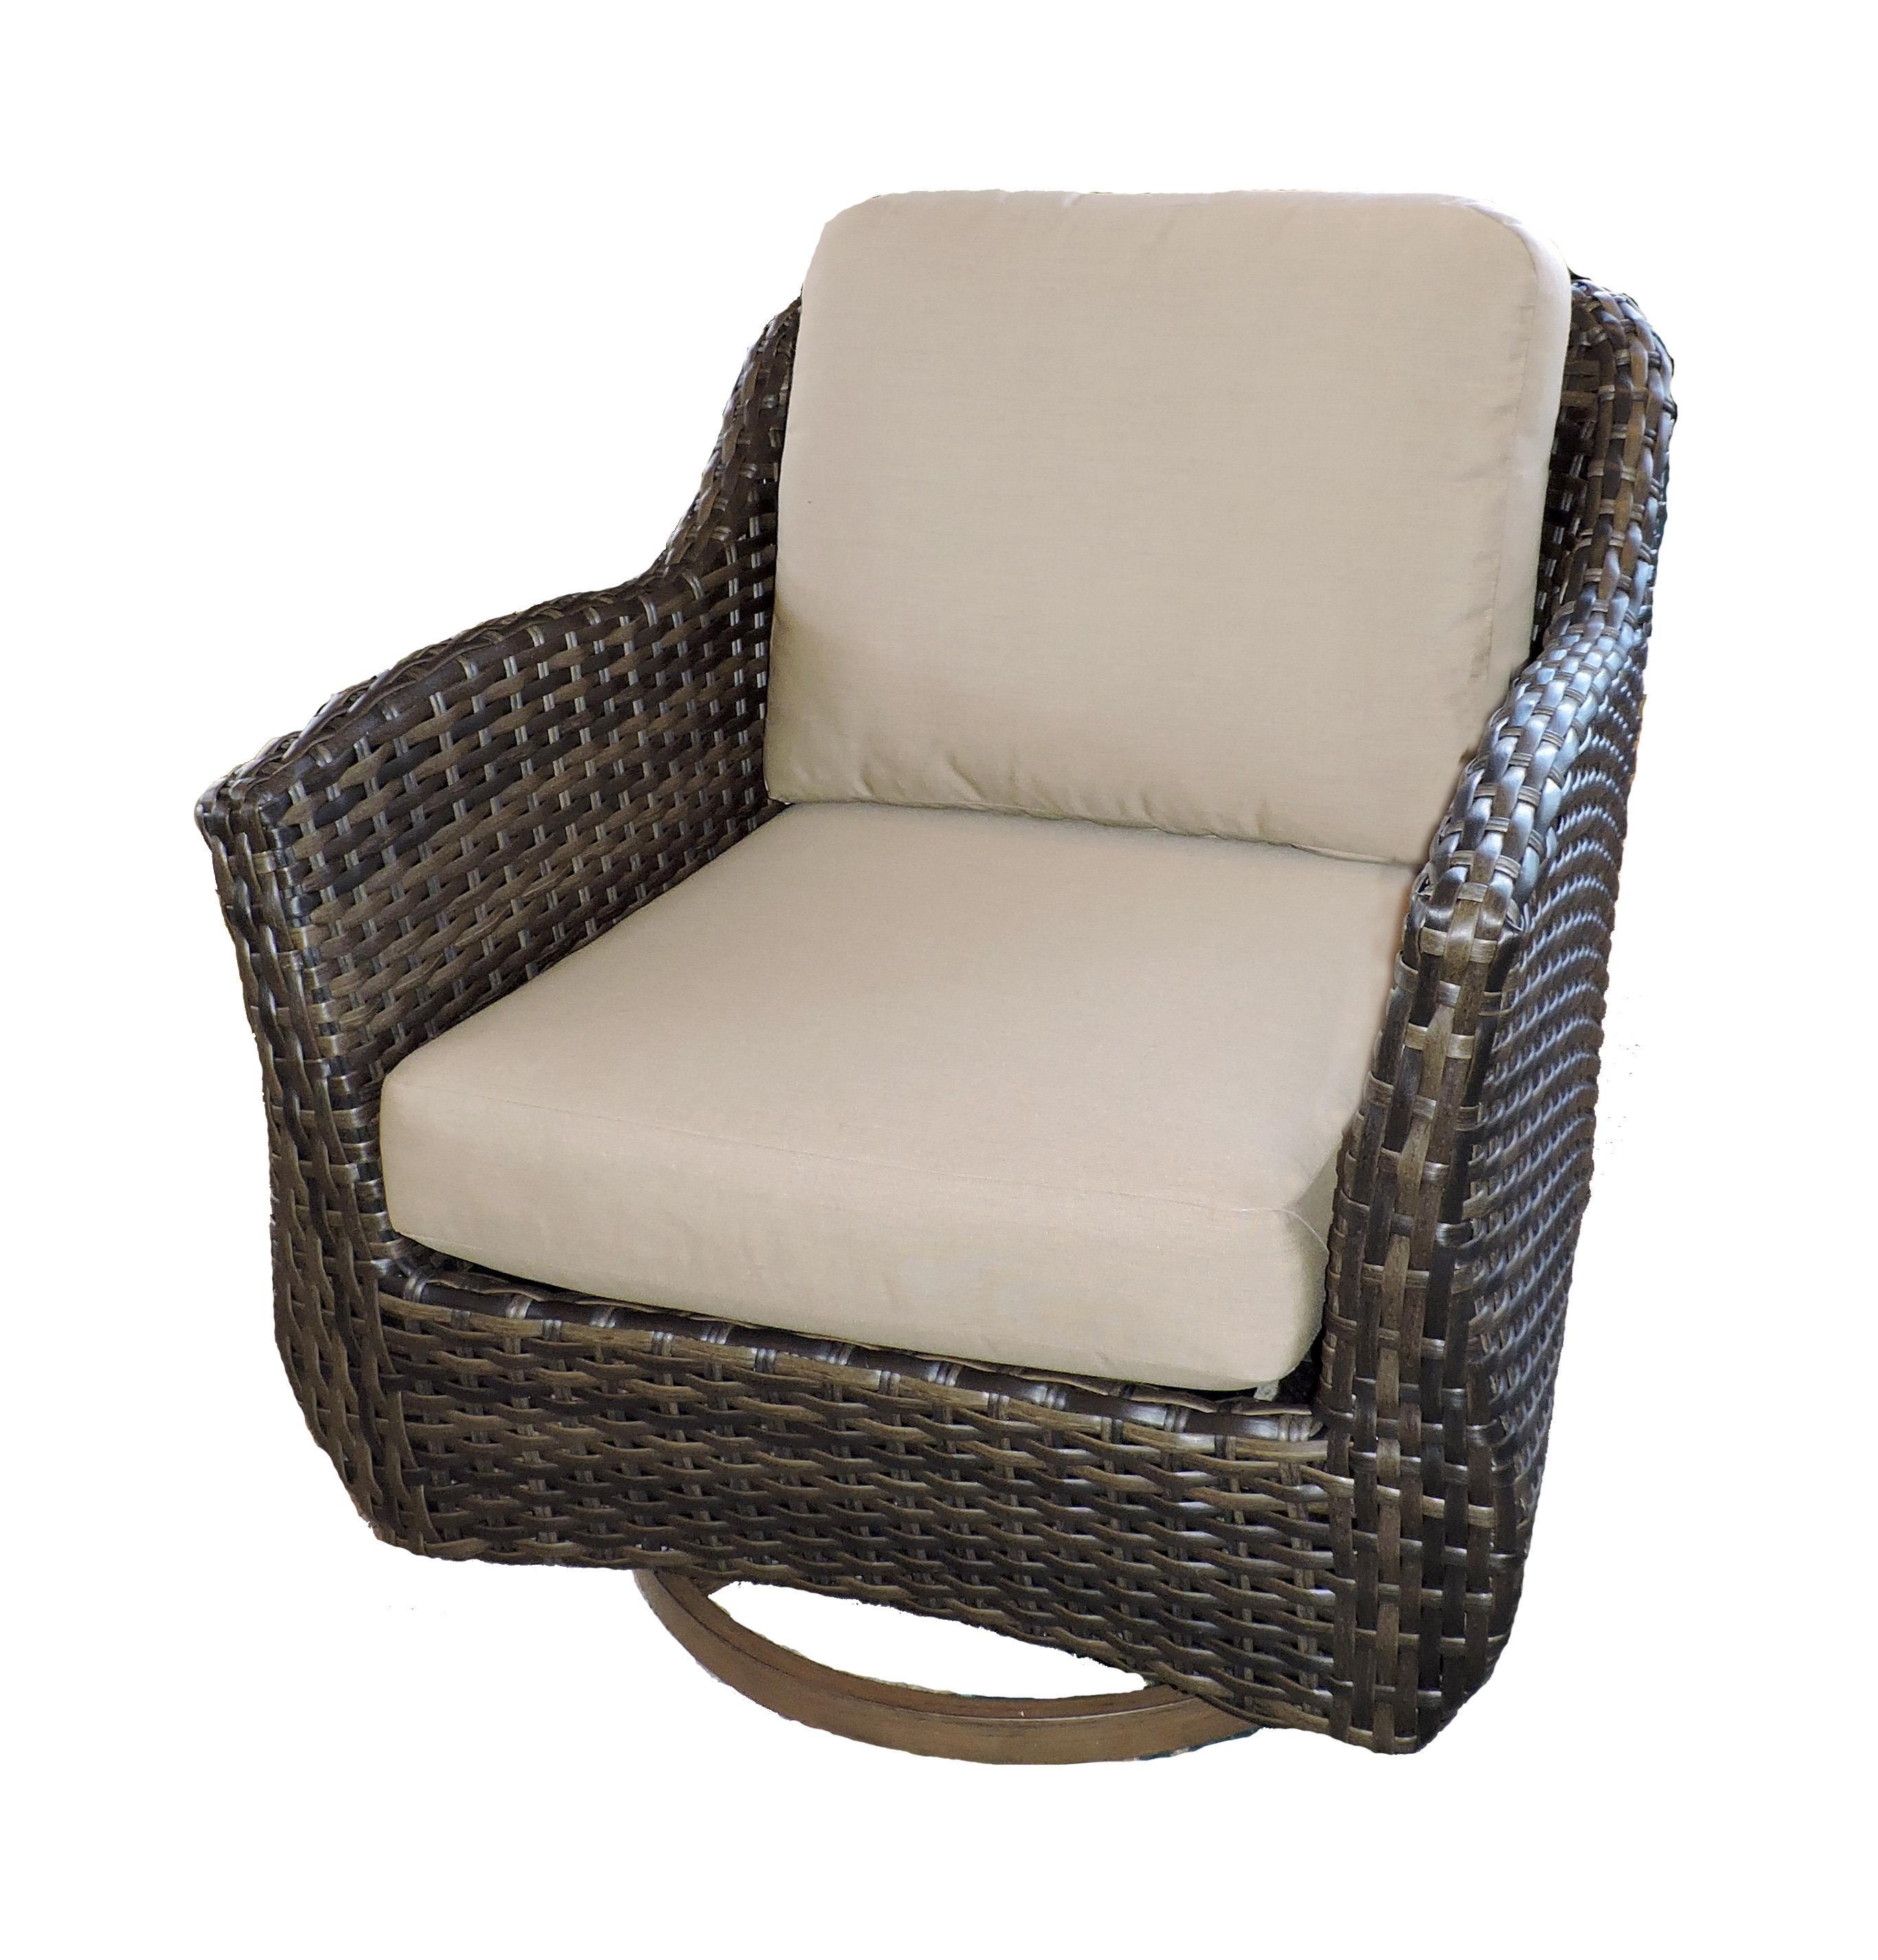 Belfort Outdoor Sycamore Outdoor Swivel Glider Chair - Item Number: W5199D SGC 5476-0000